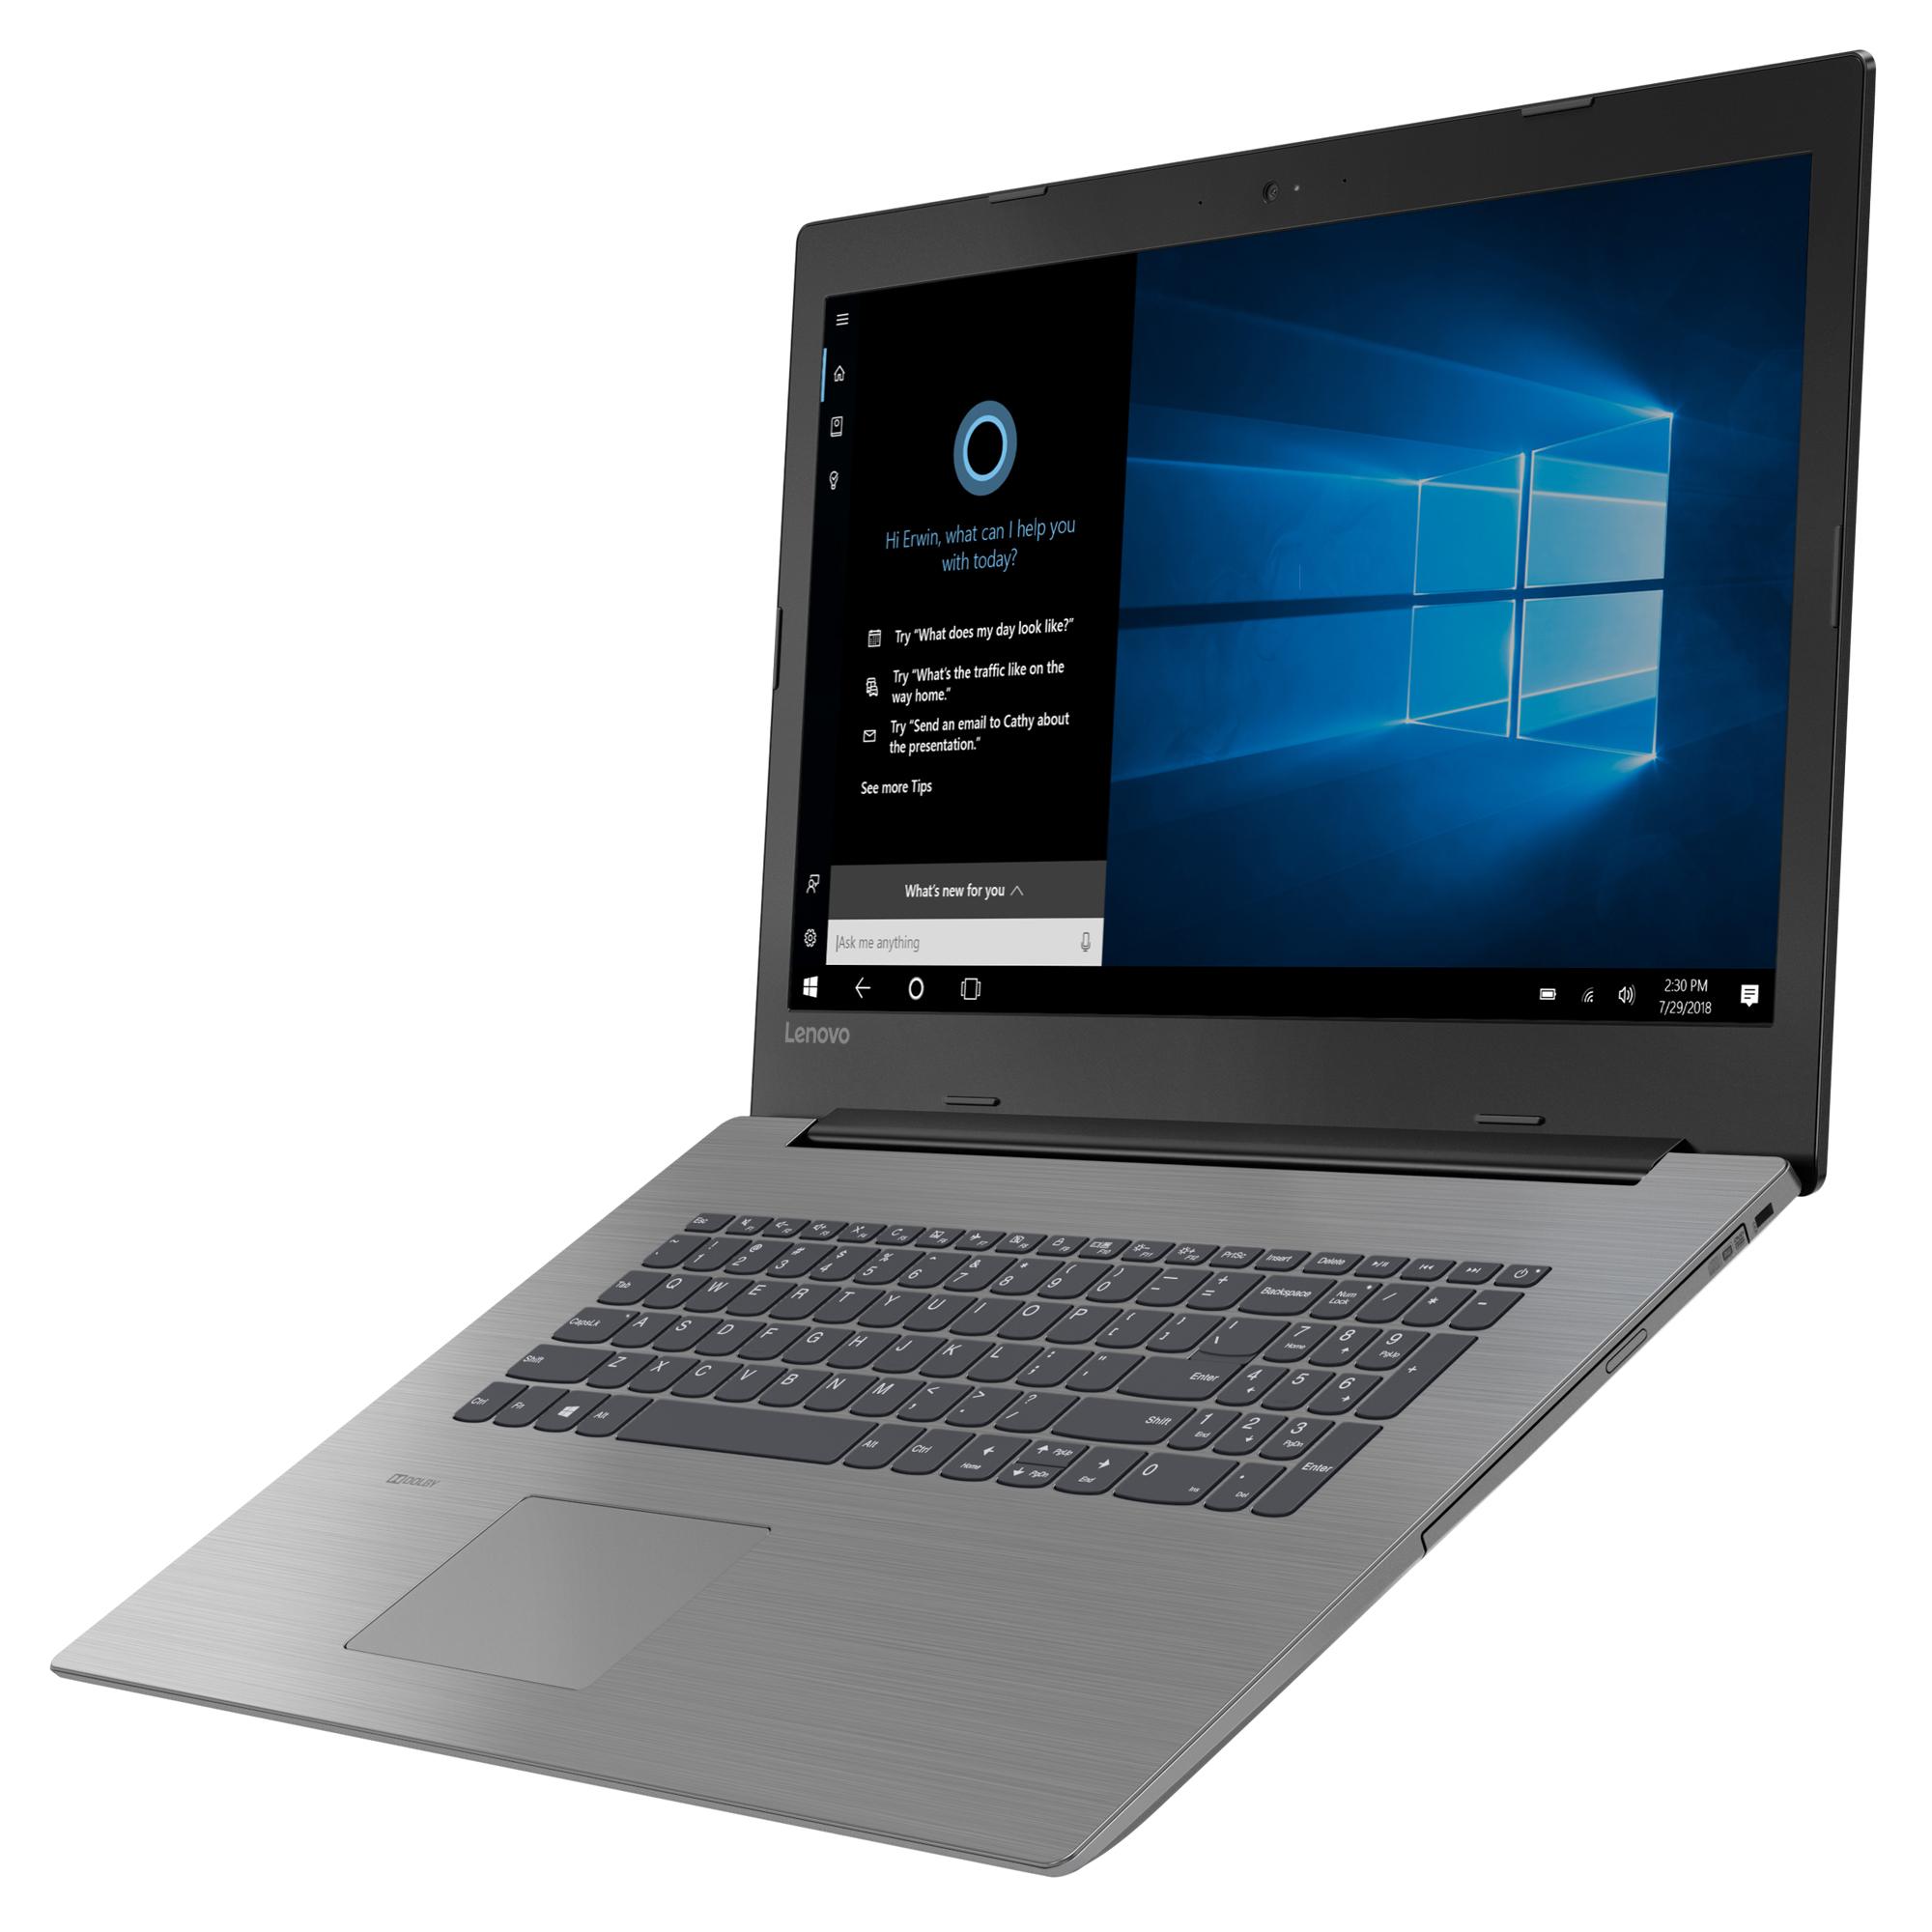 Фото  Ноутбук Lenovo ideapad 330-17AST Onyx Black (81D70005RU)